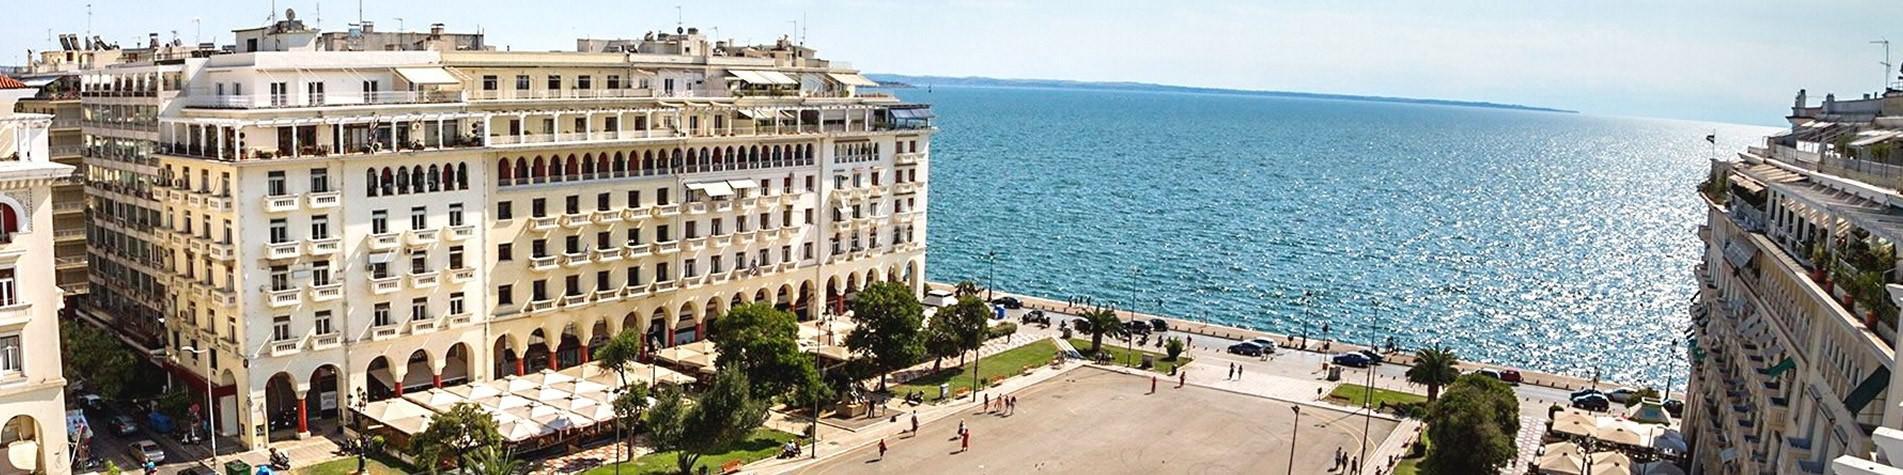 Thessaloniki Holidays with Cyplon Holidays